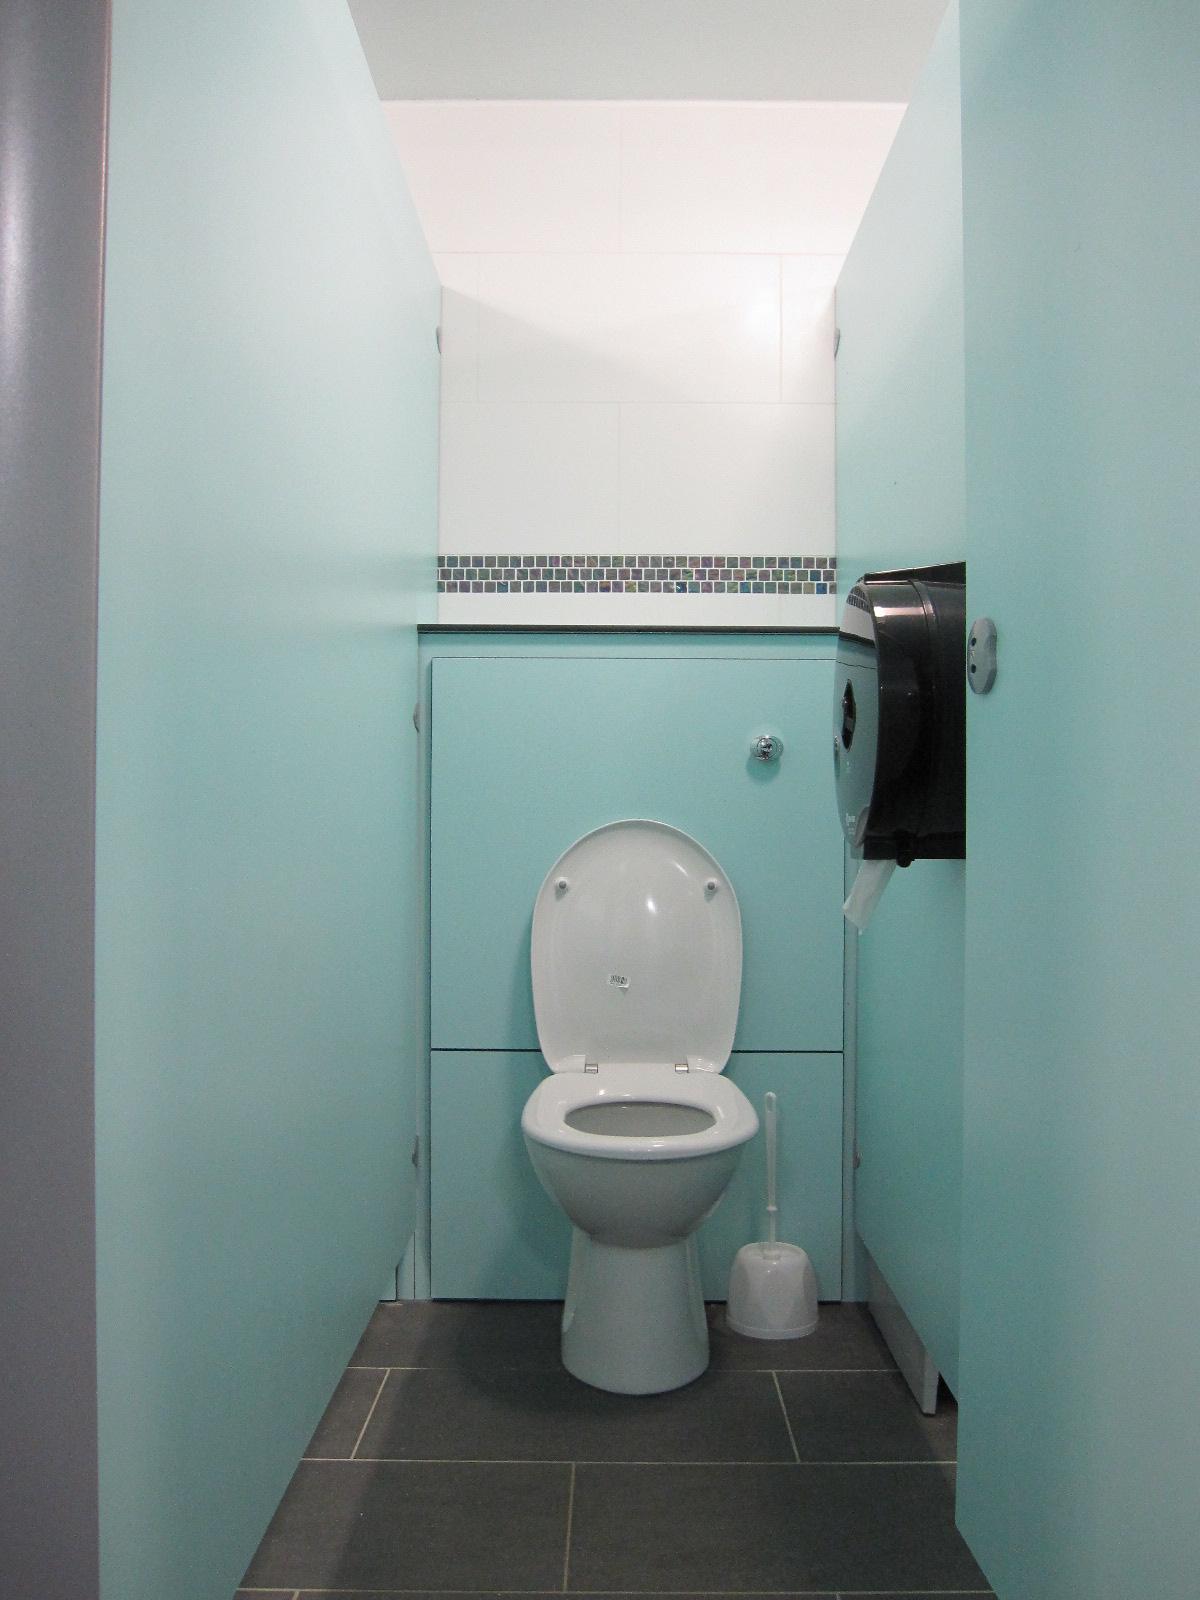 Appuldurcombe Gardens Toilet Cubicles